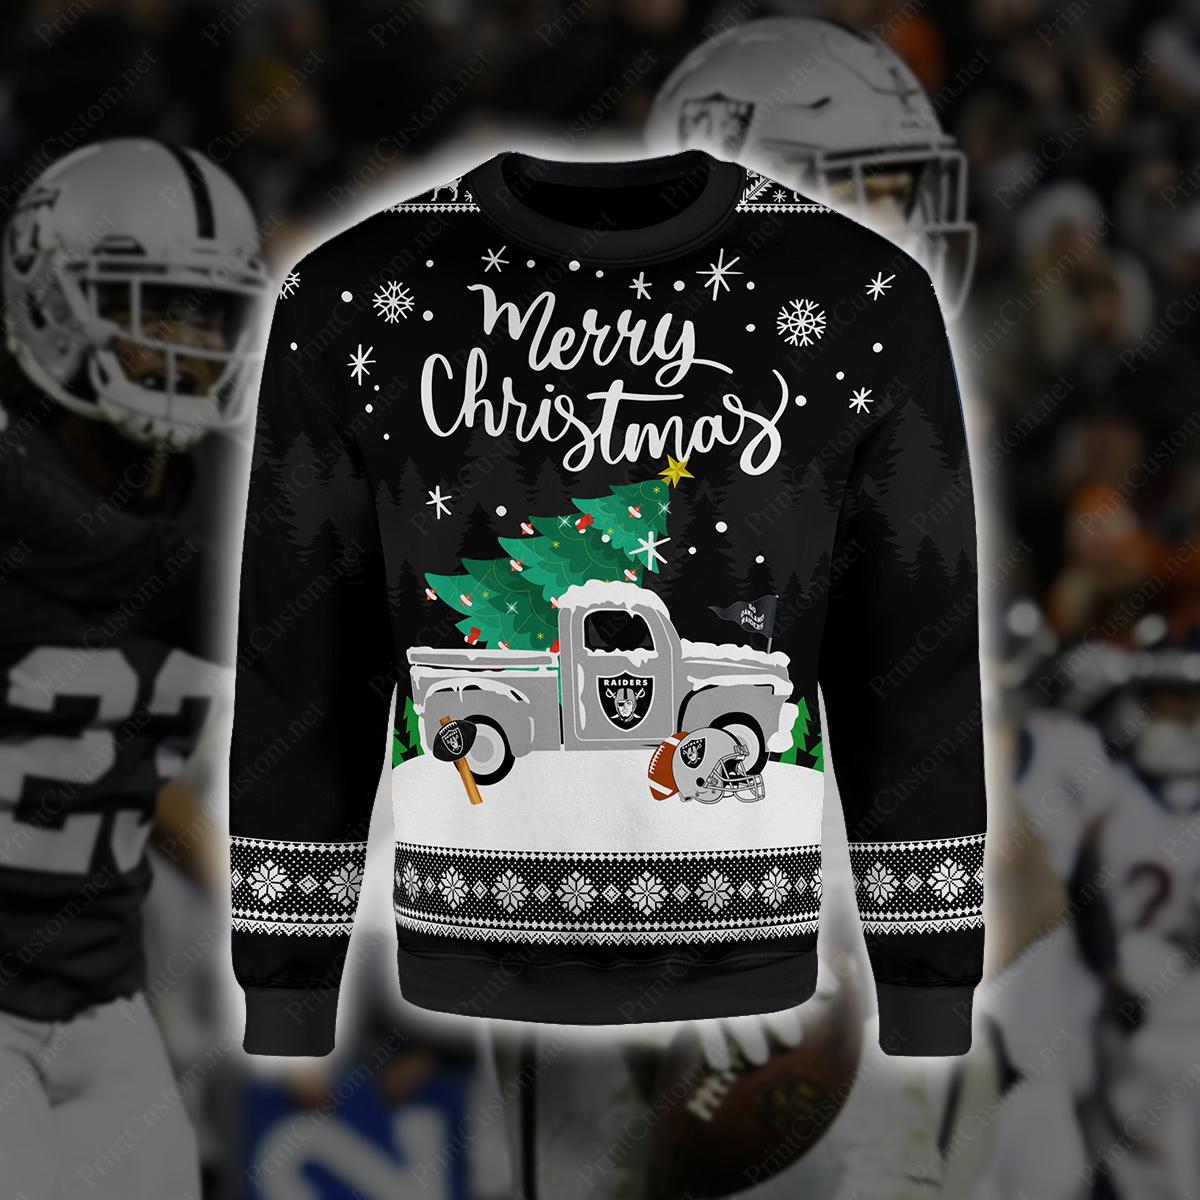 Merry christmas oakland raiders full printing sweater